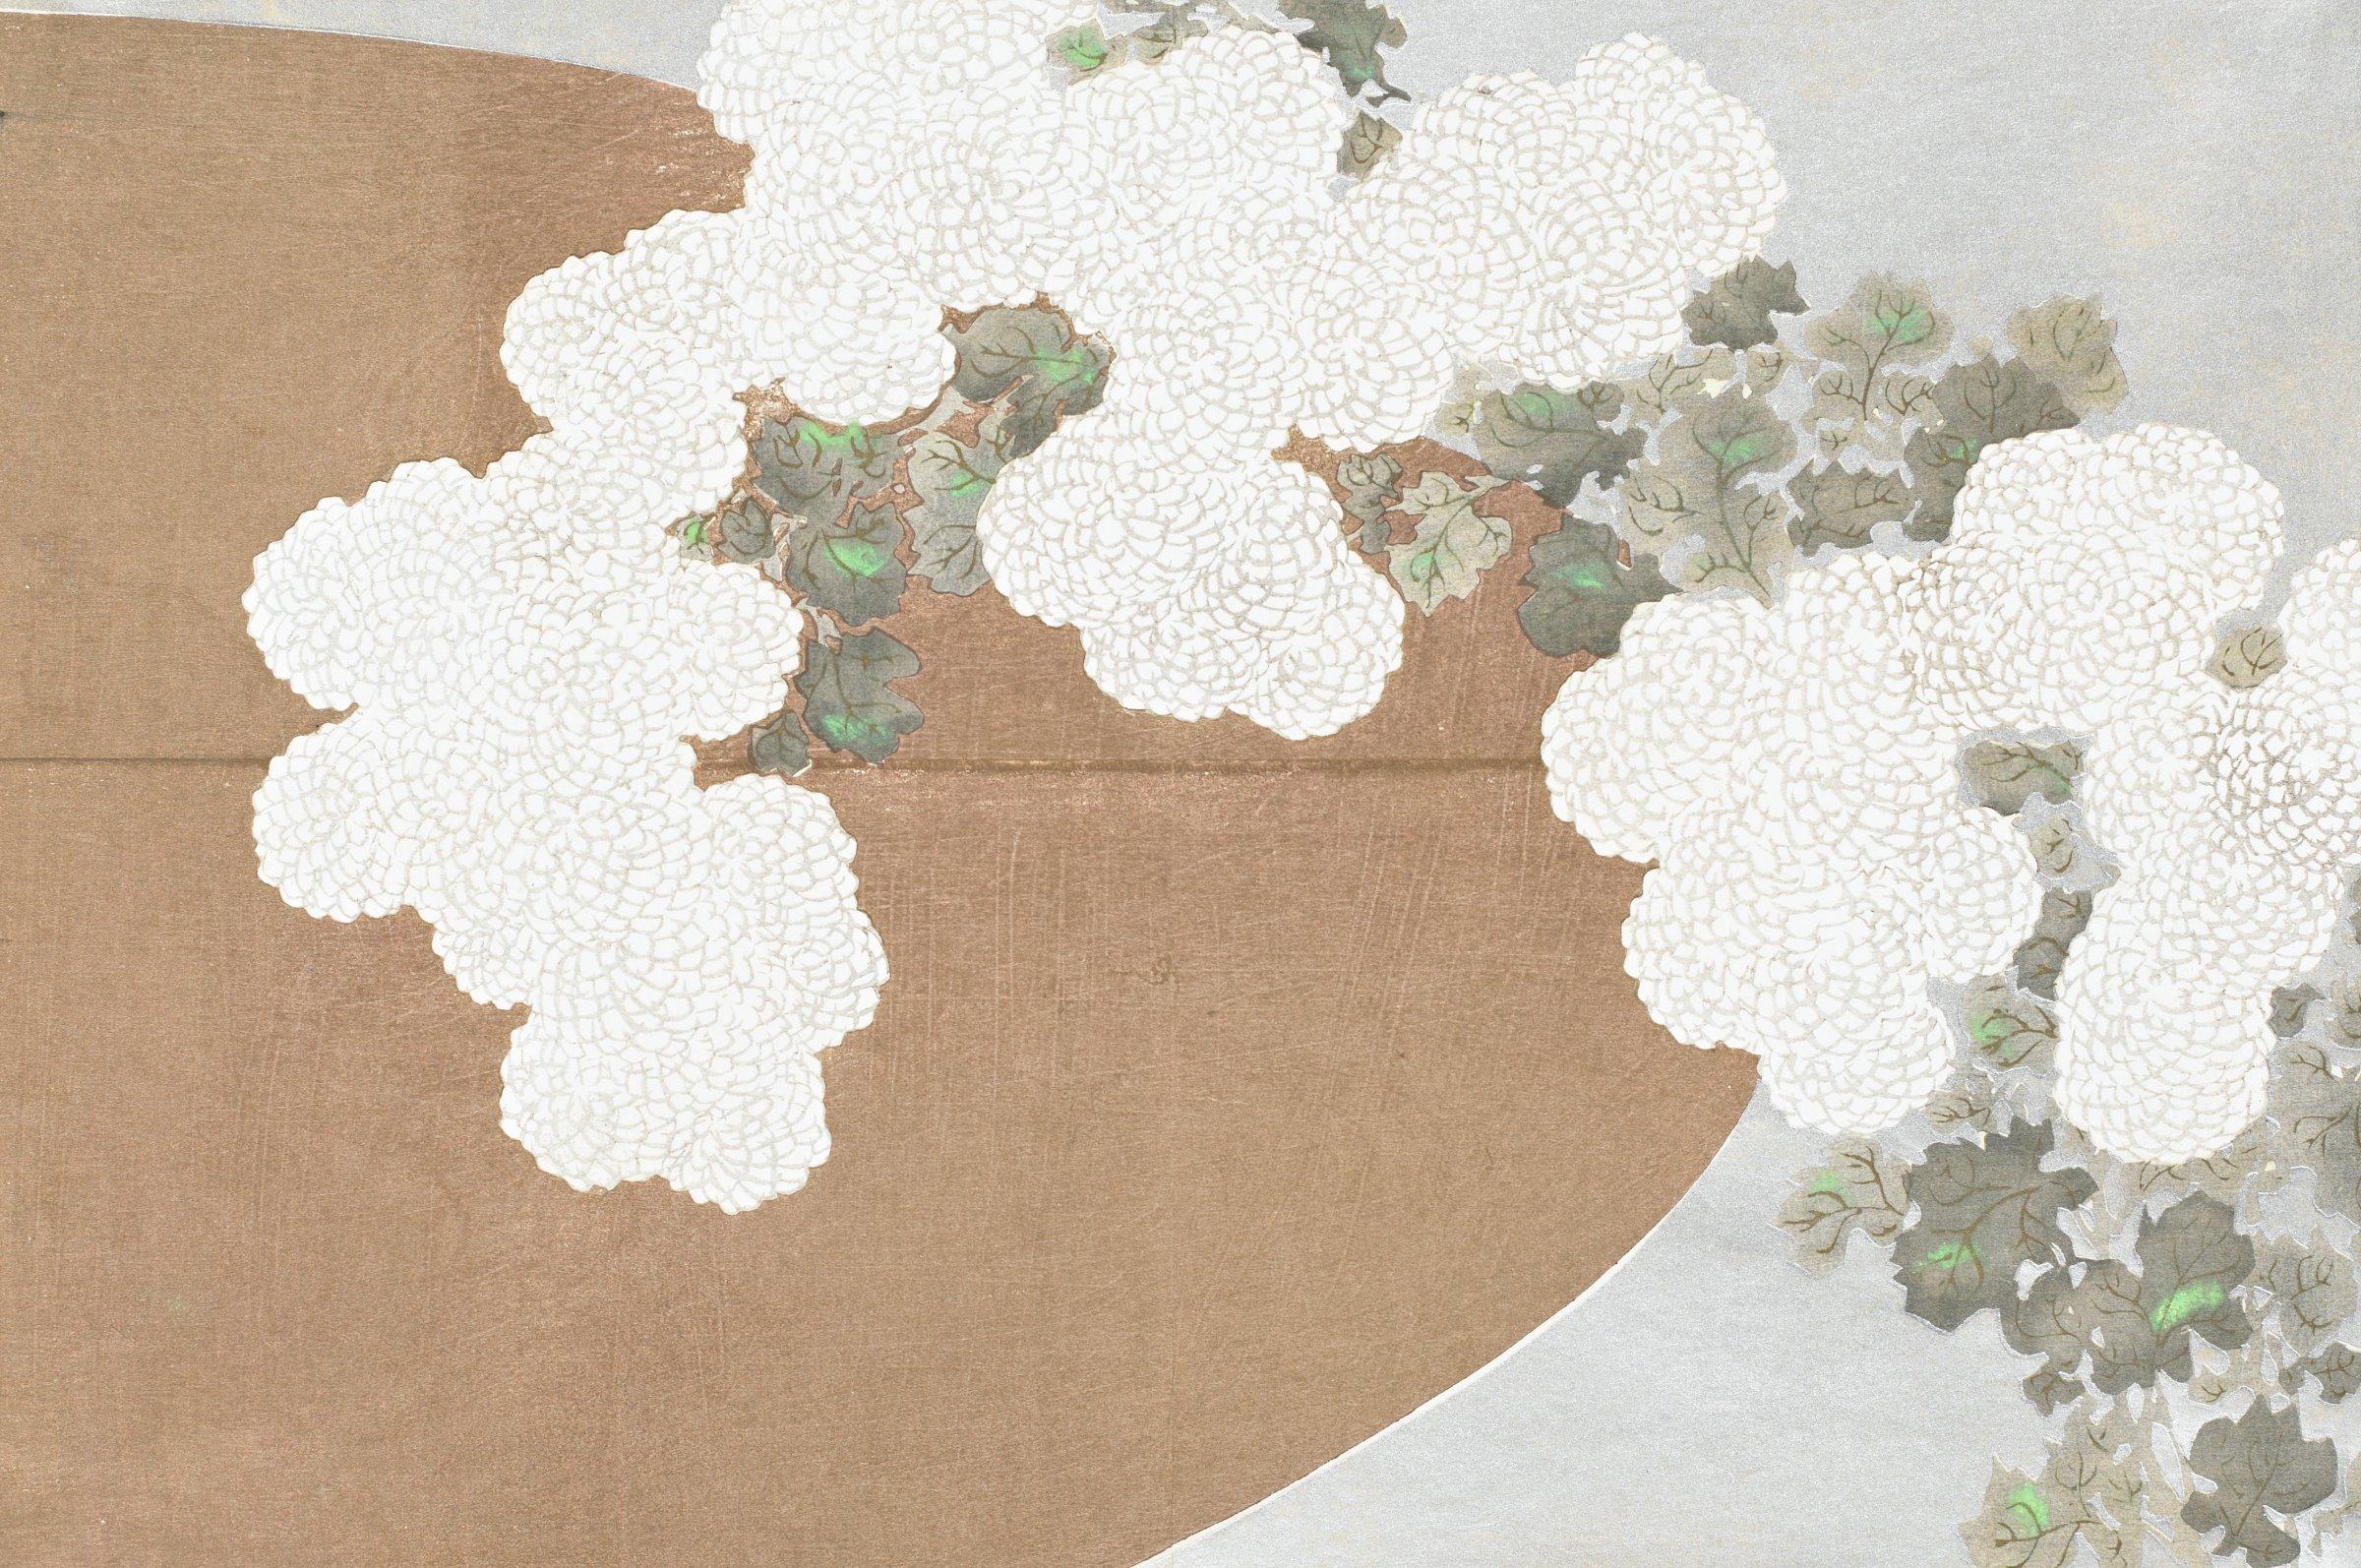 Kiku (Chrysanthemum), from Momoyogusa (A World of Things), Volume 1, Kamisaka Sekka, ink and color on paper